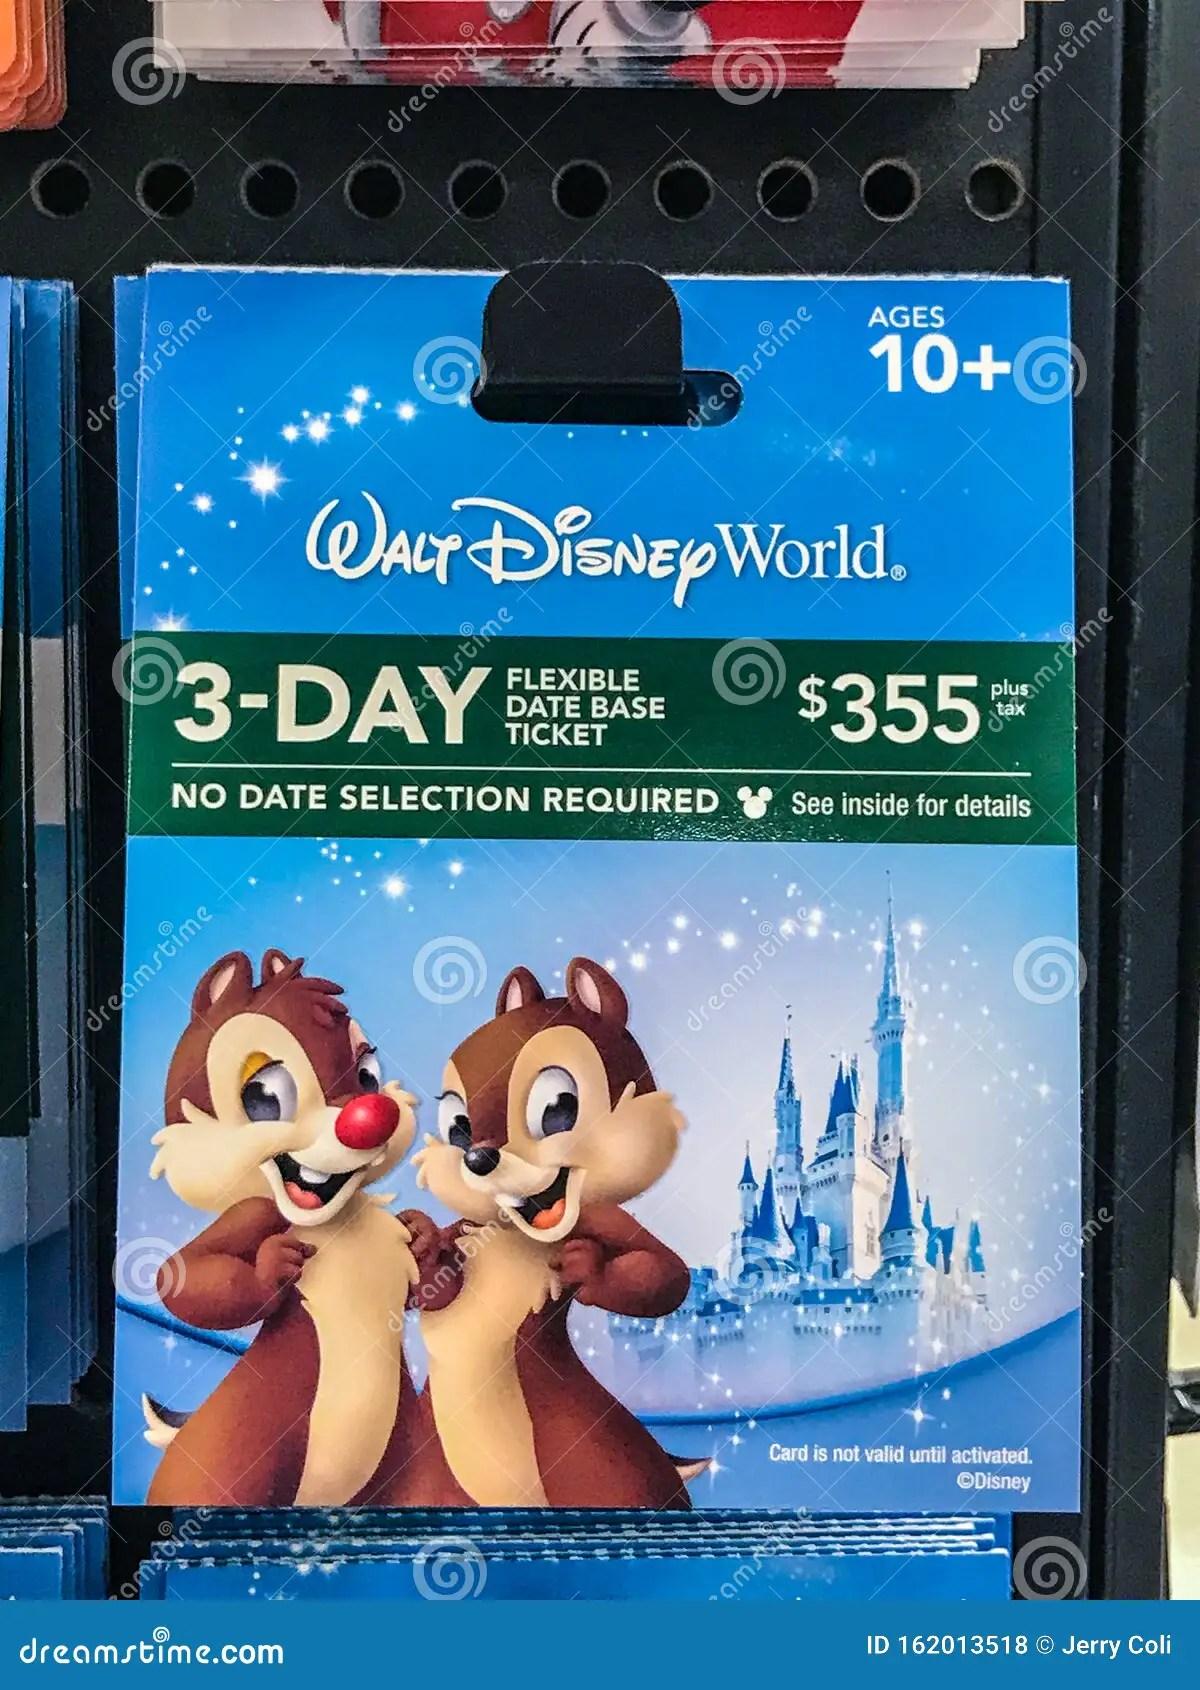 https www dreamstime com walt disney world gift cards sale cvs store image162013518